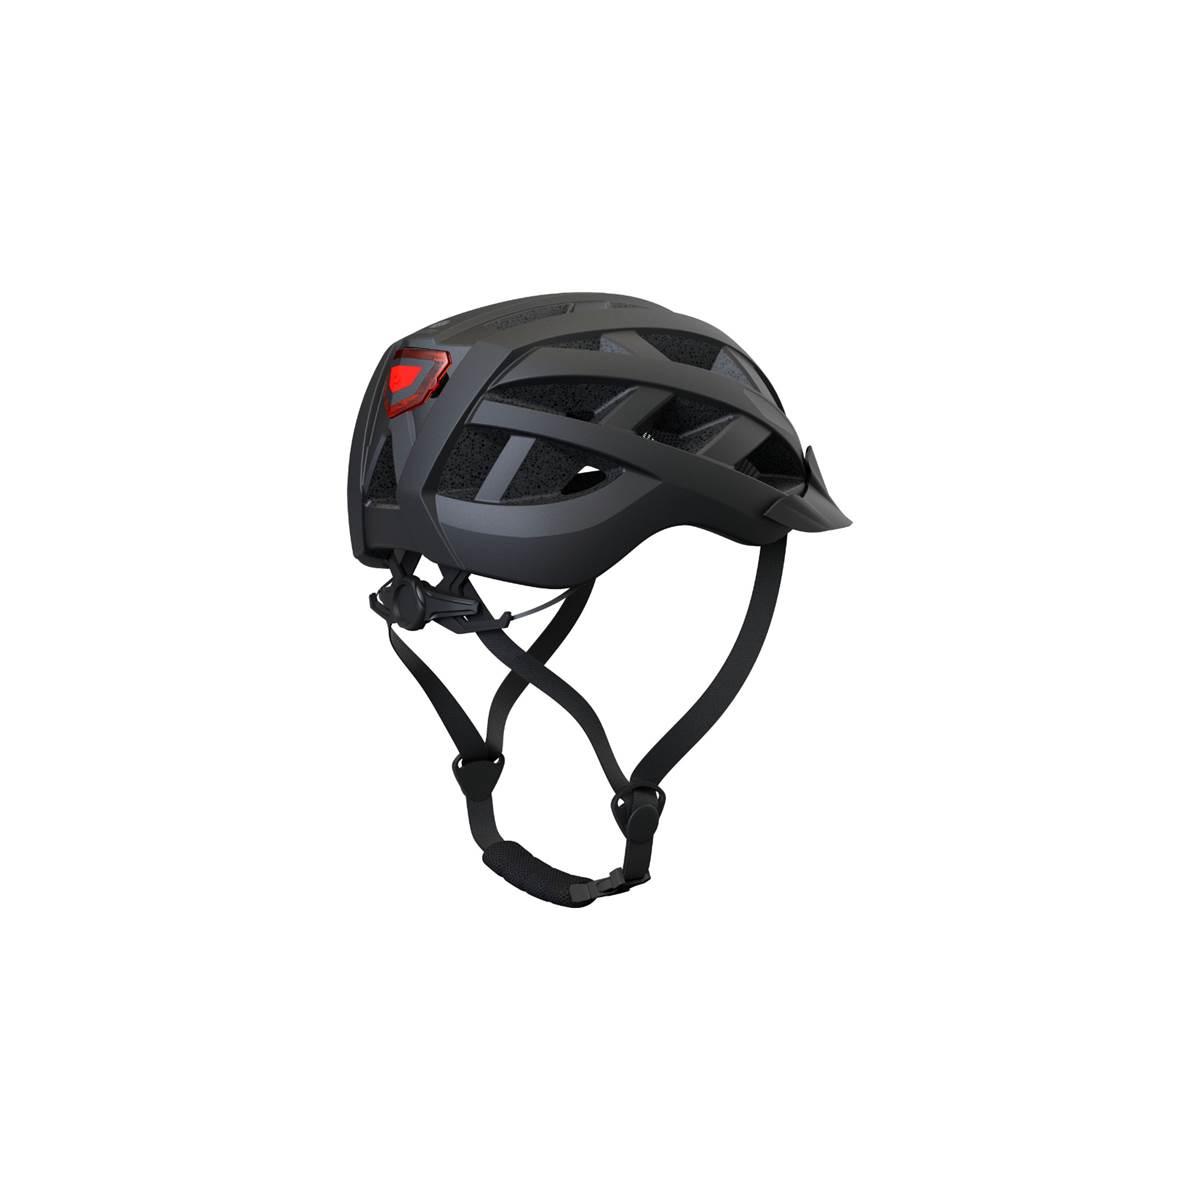 Casque vélo noir Taille L Made for XIAOMI